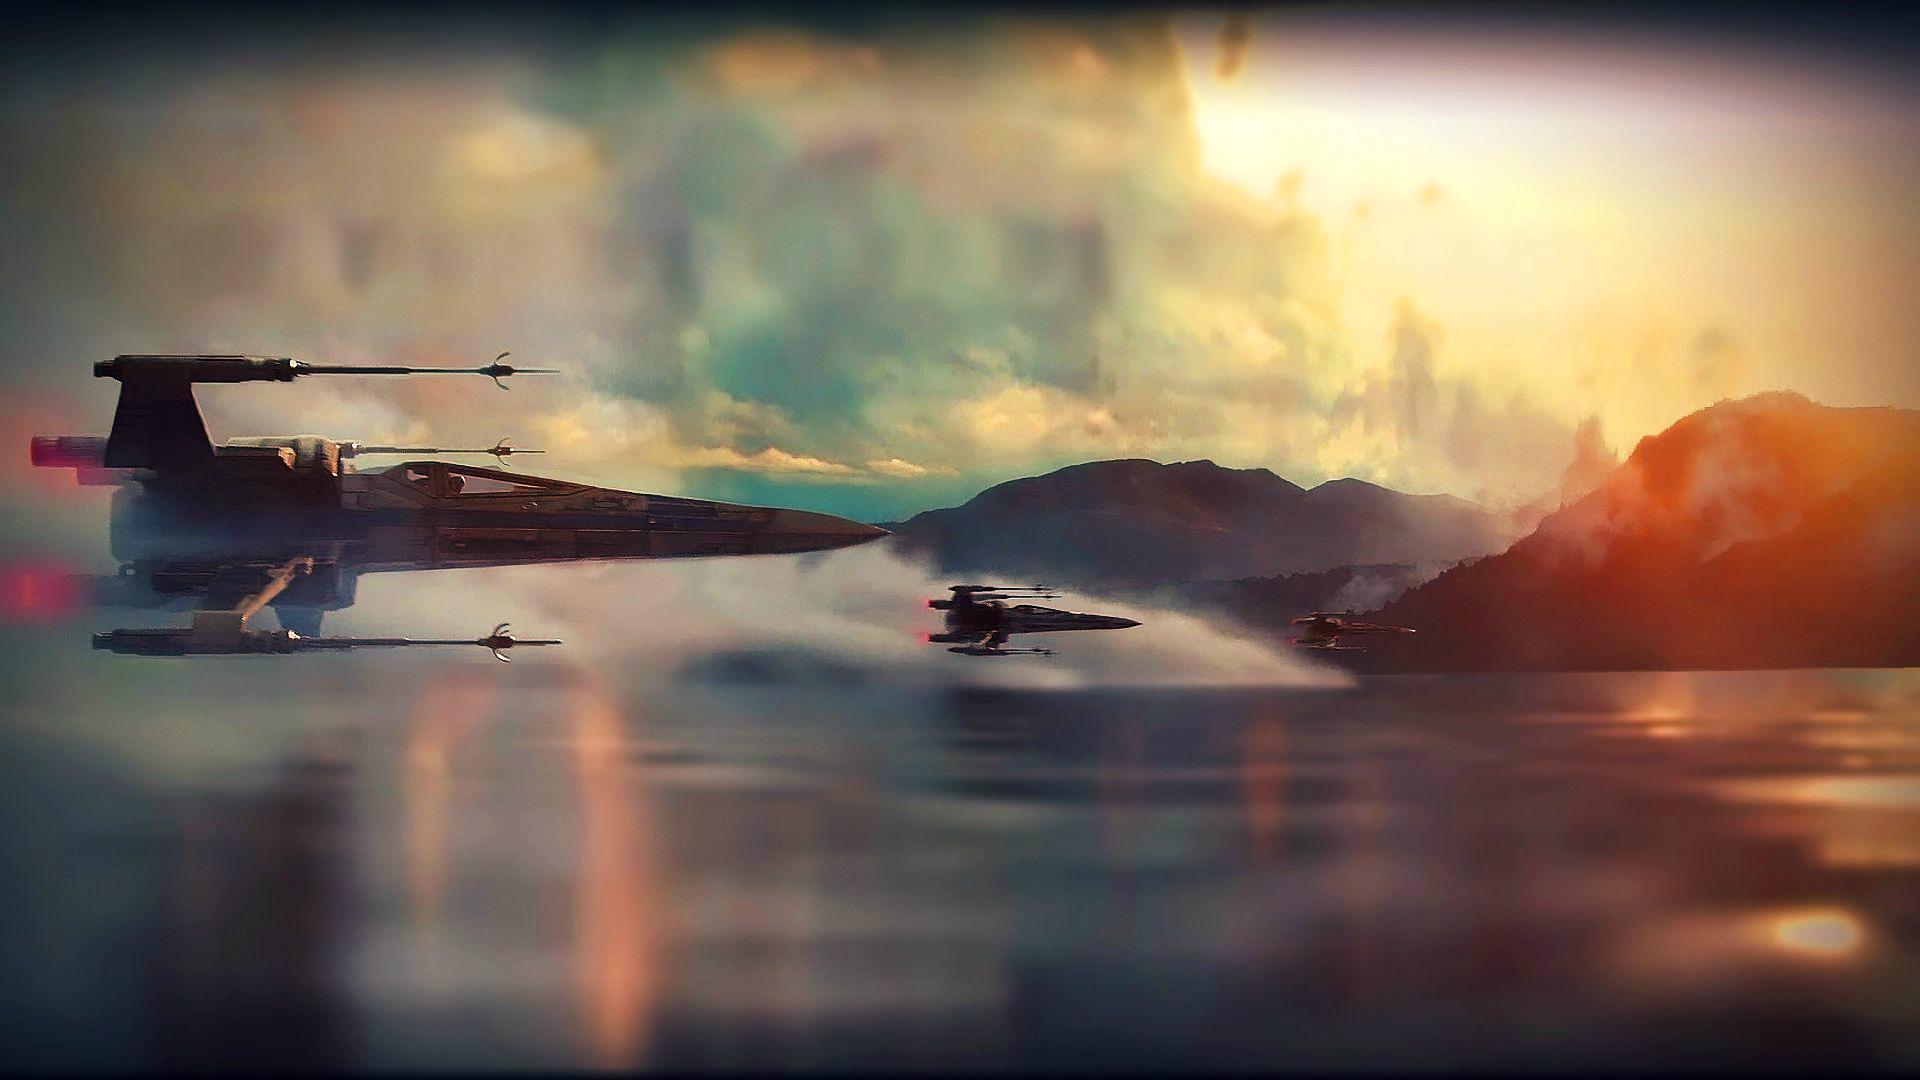 Filme   Star Wars Episode VII The Force Awakens Wallpaper 1920x1080